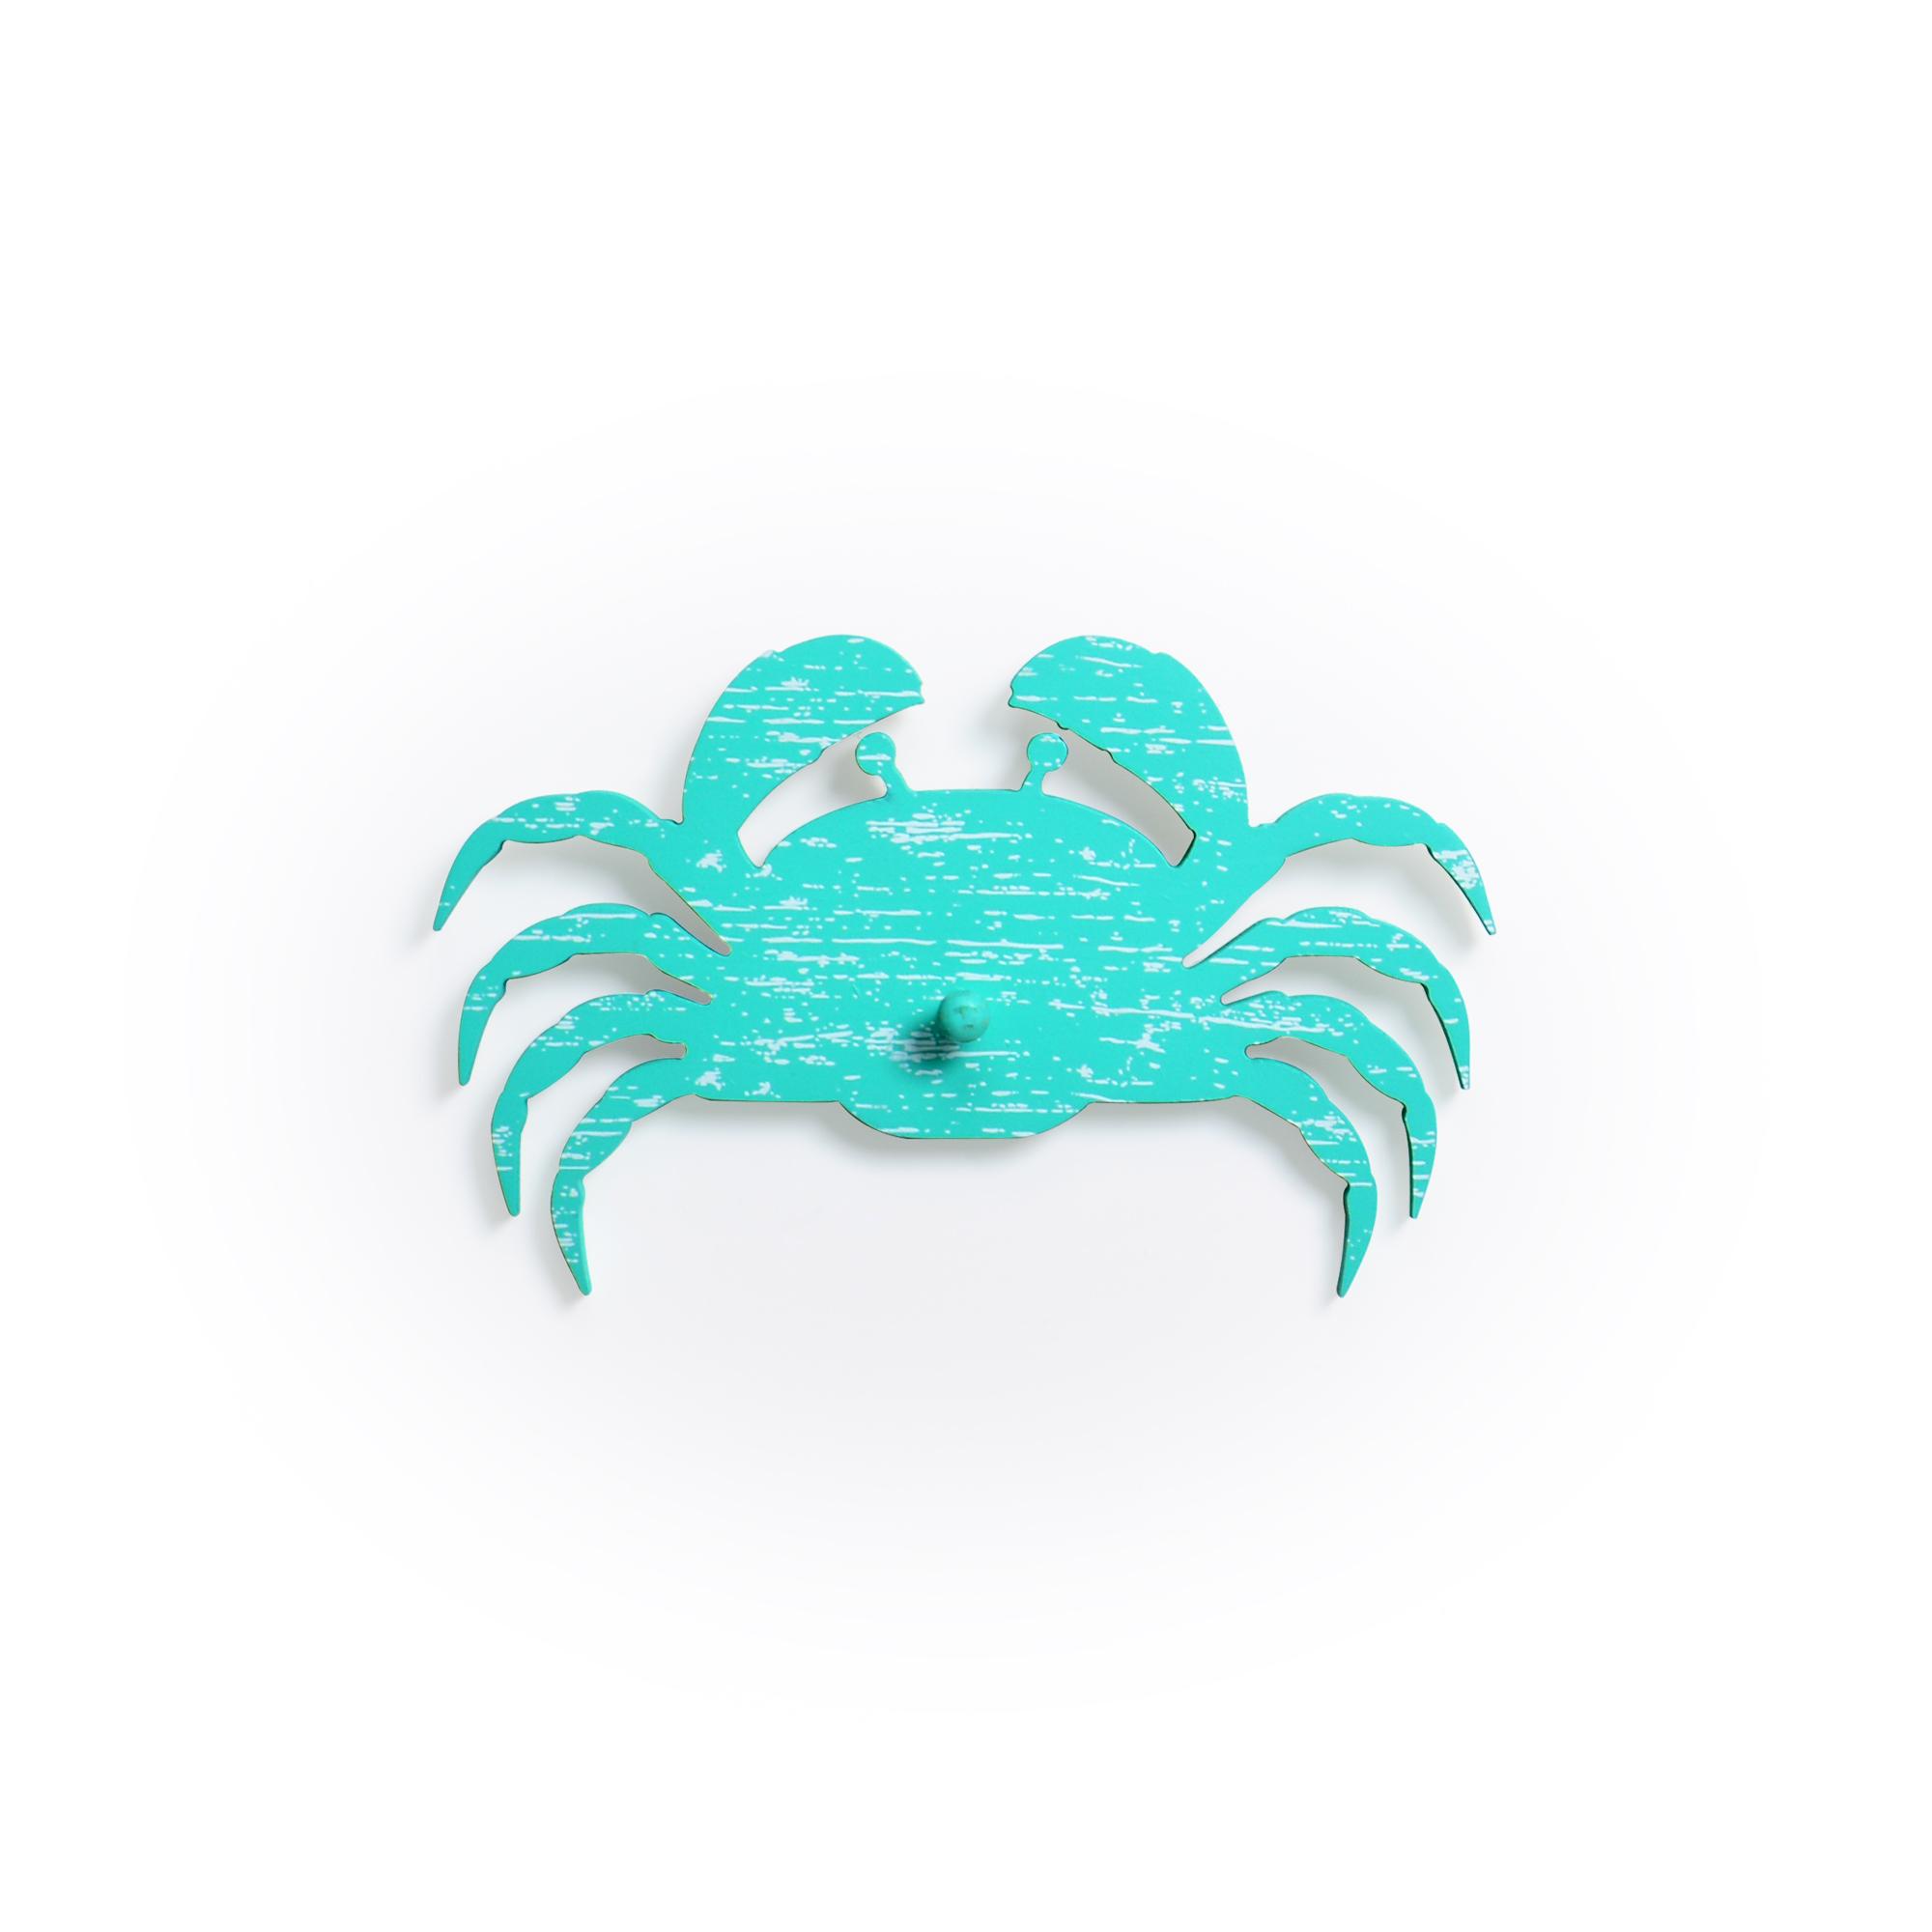 Caranguejo Decorativo com ganchos Tiffany